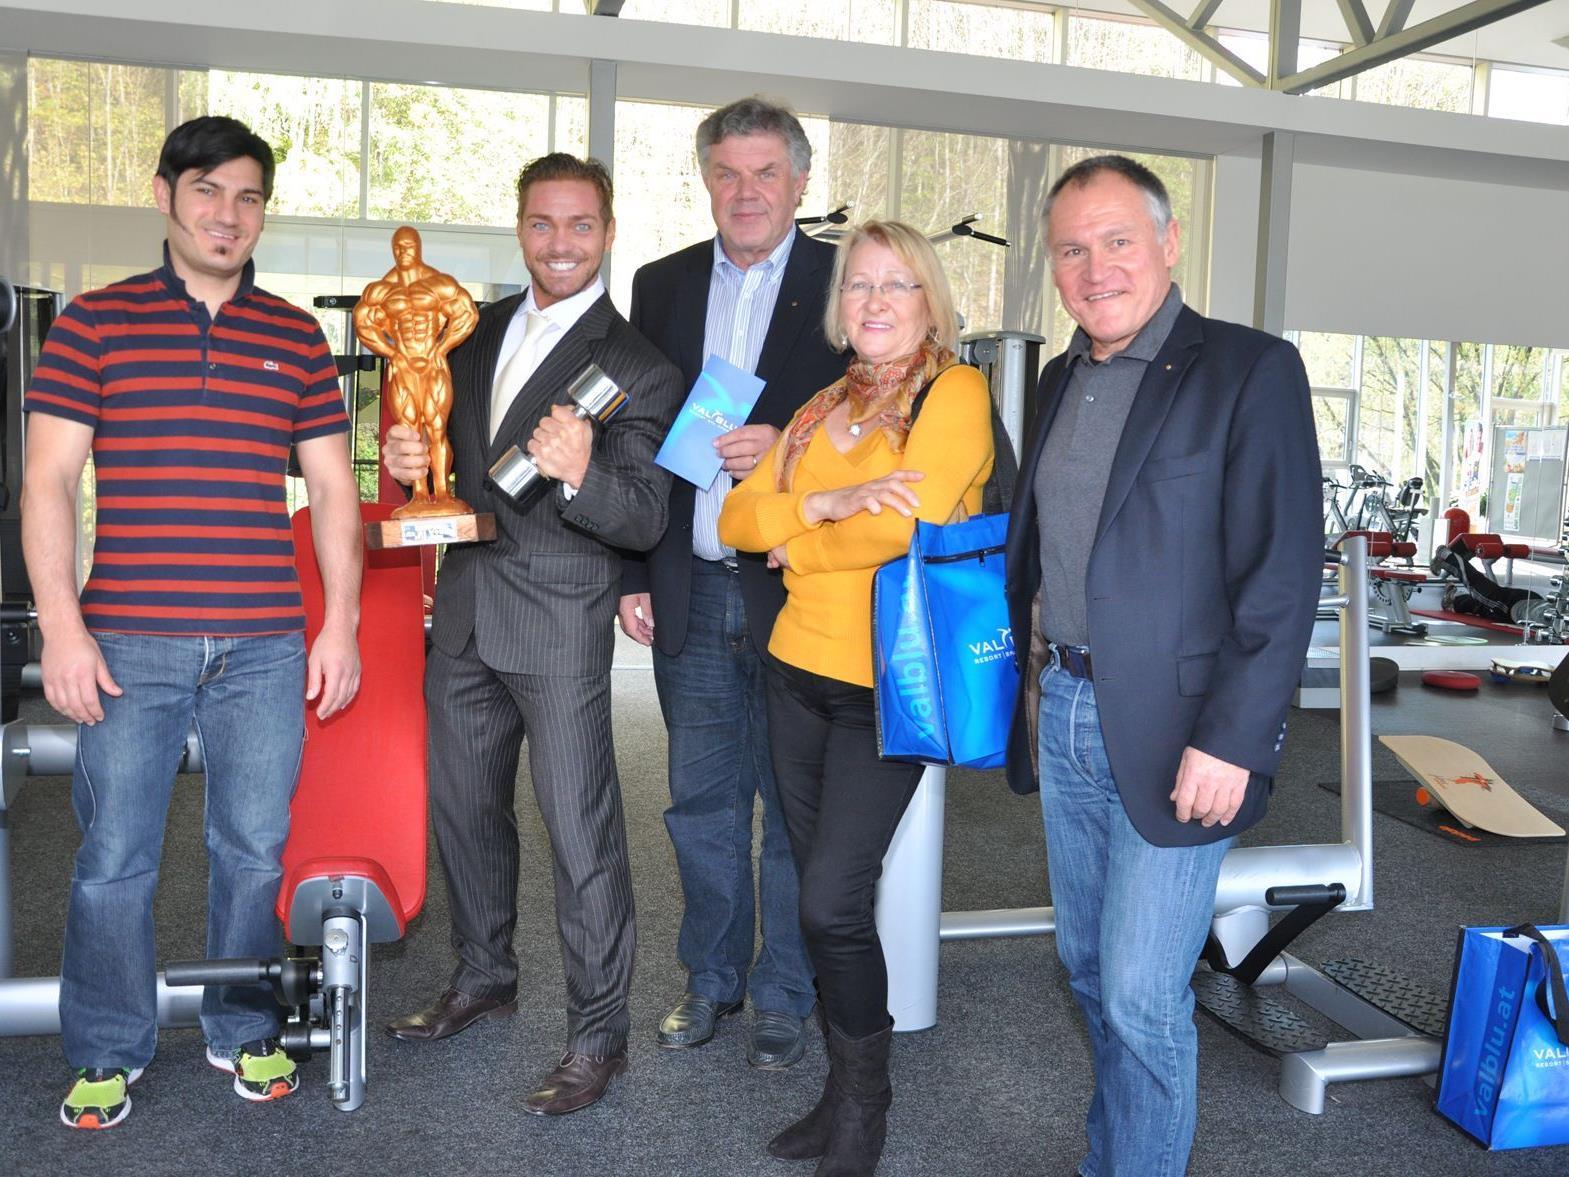 Michael Allgäuer, Bernd Österle, Bürgermeister Mandi Katzenmayer, Mathilde Österle (Mutter), Dir. Klaus Allgäuer) Das VAL BLU ist das Trainingscamp von Fitness Weltmeister Bernd Österle.